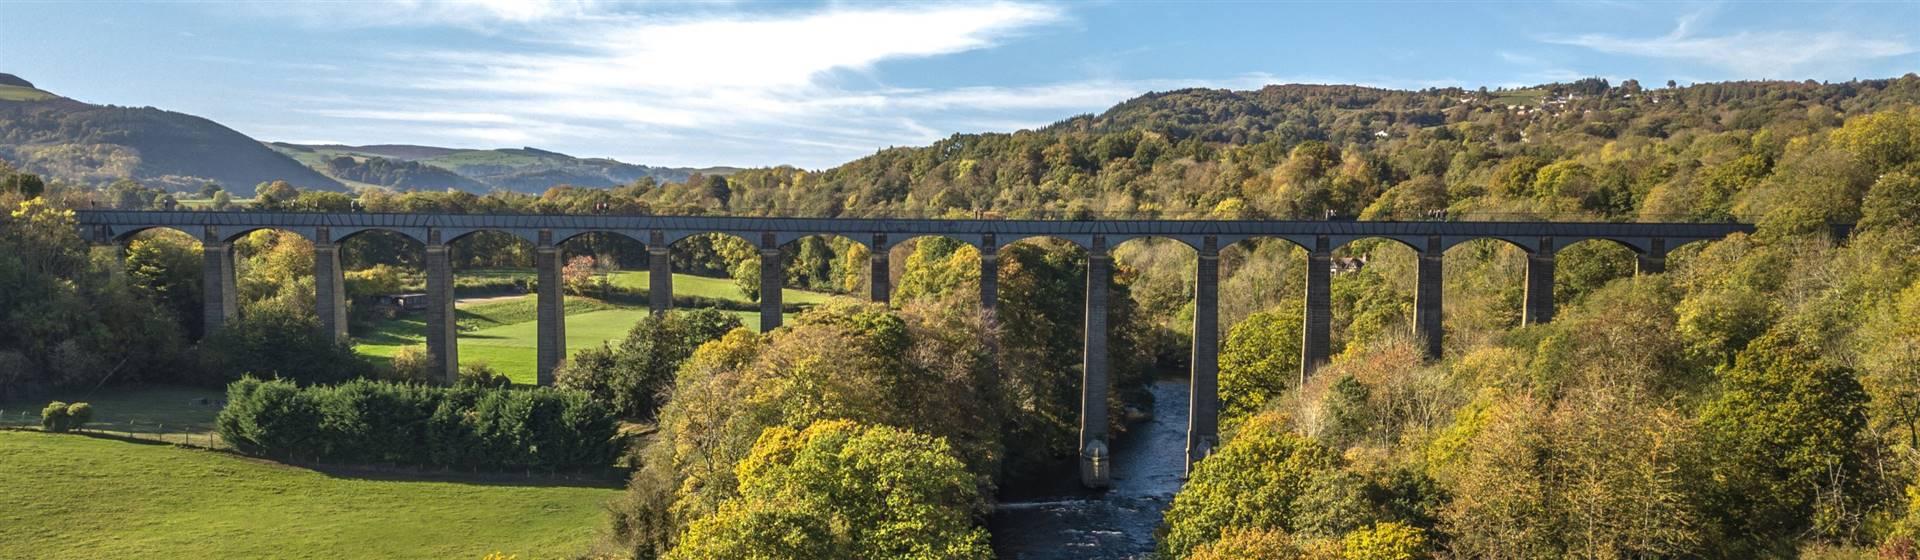 "<img src=""/pontcysyllte-aqueduct-head-shutterstock.jpeg"" alt=""Pontcysyllte Aqueduct""/>"